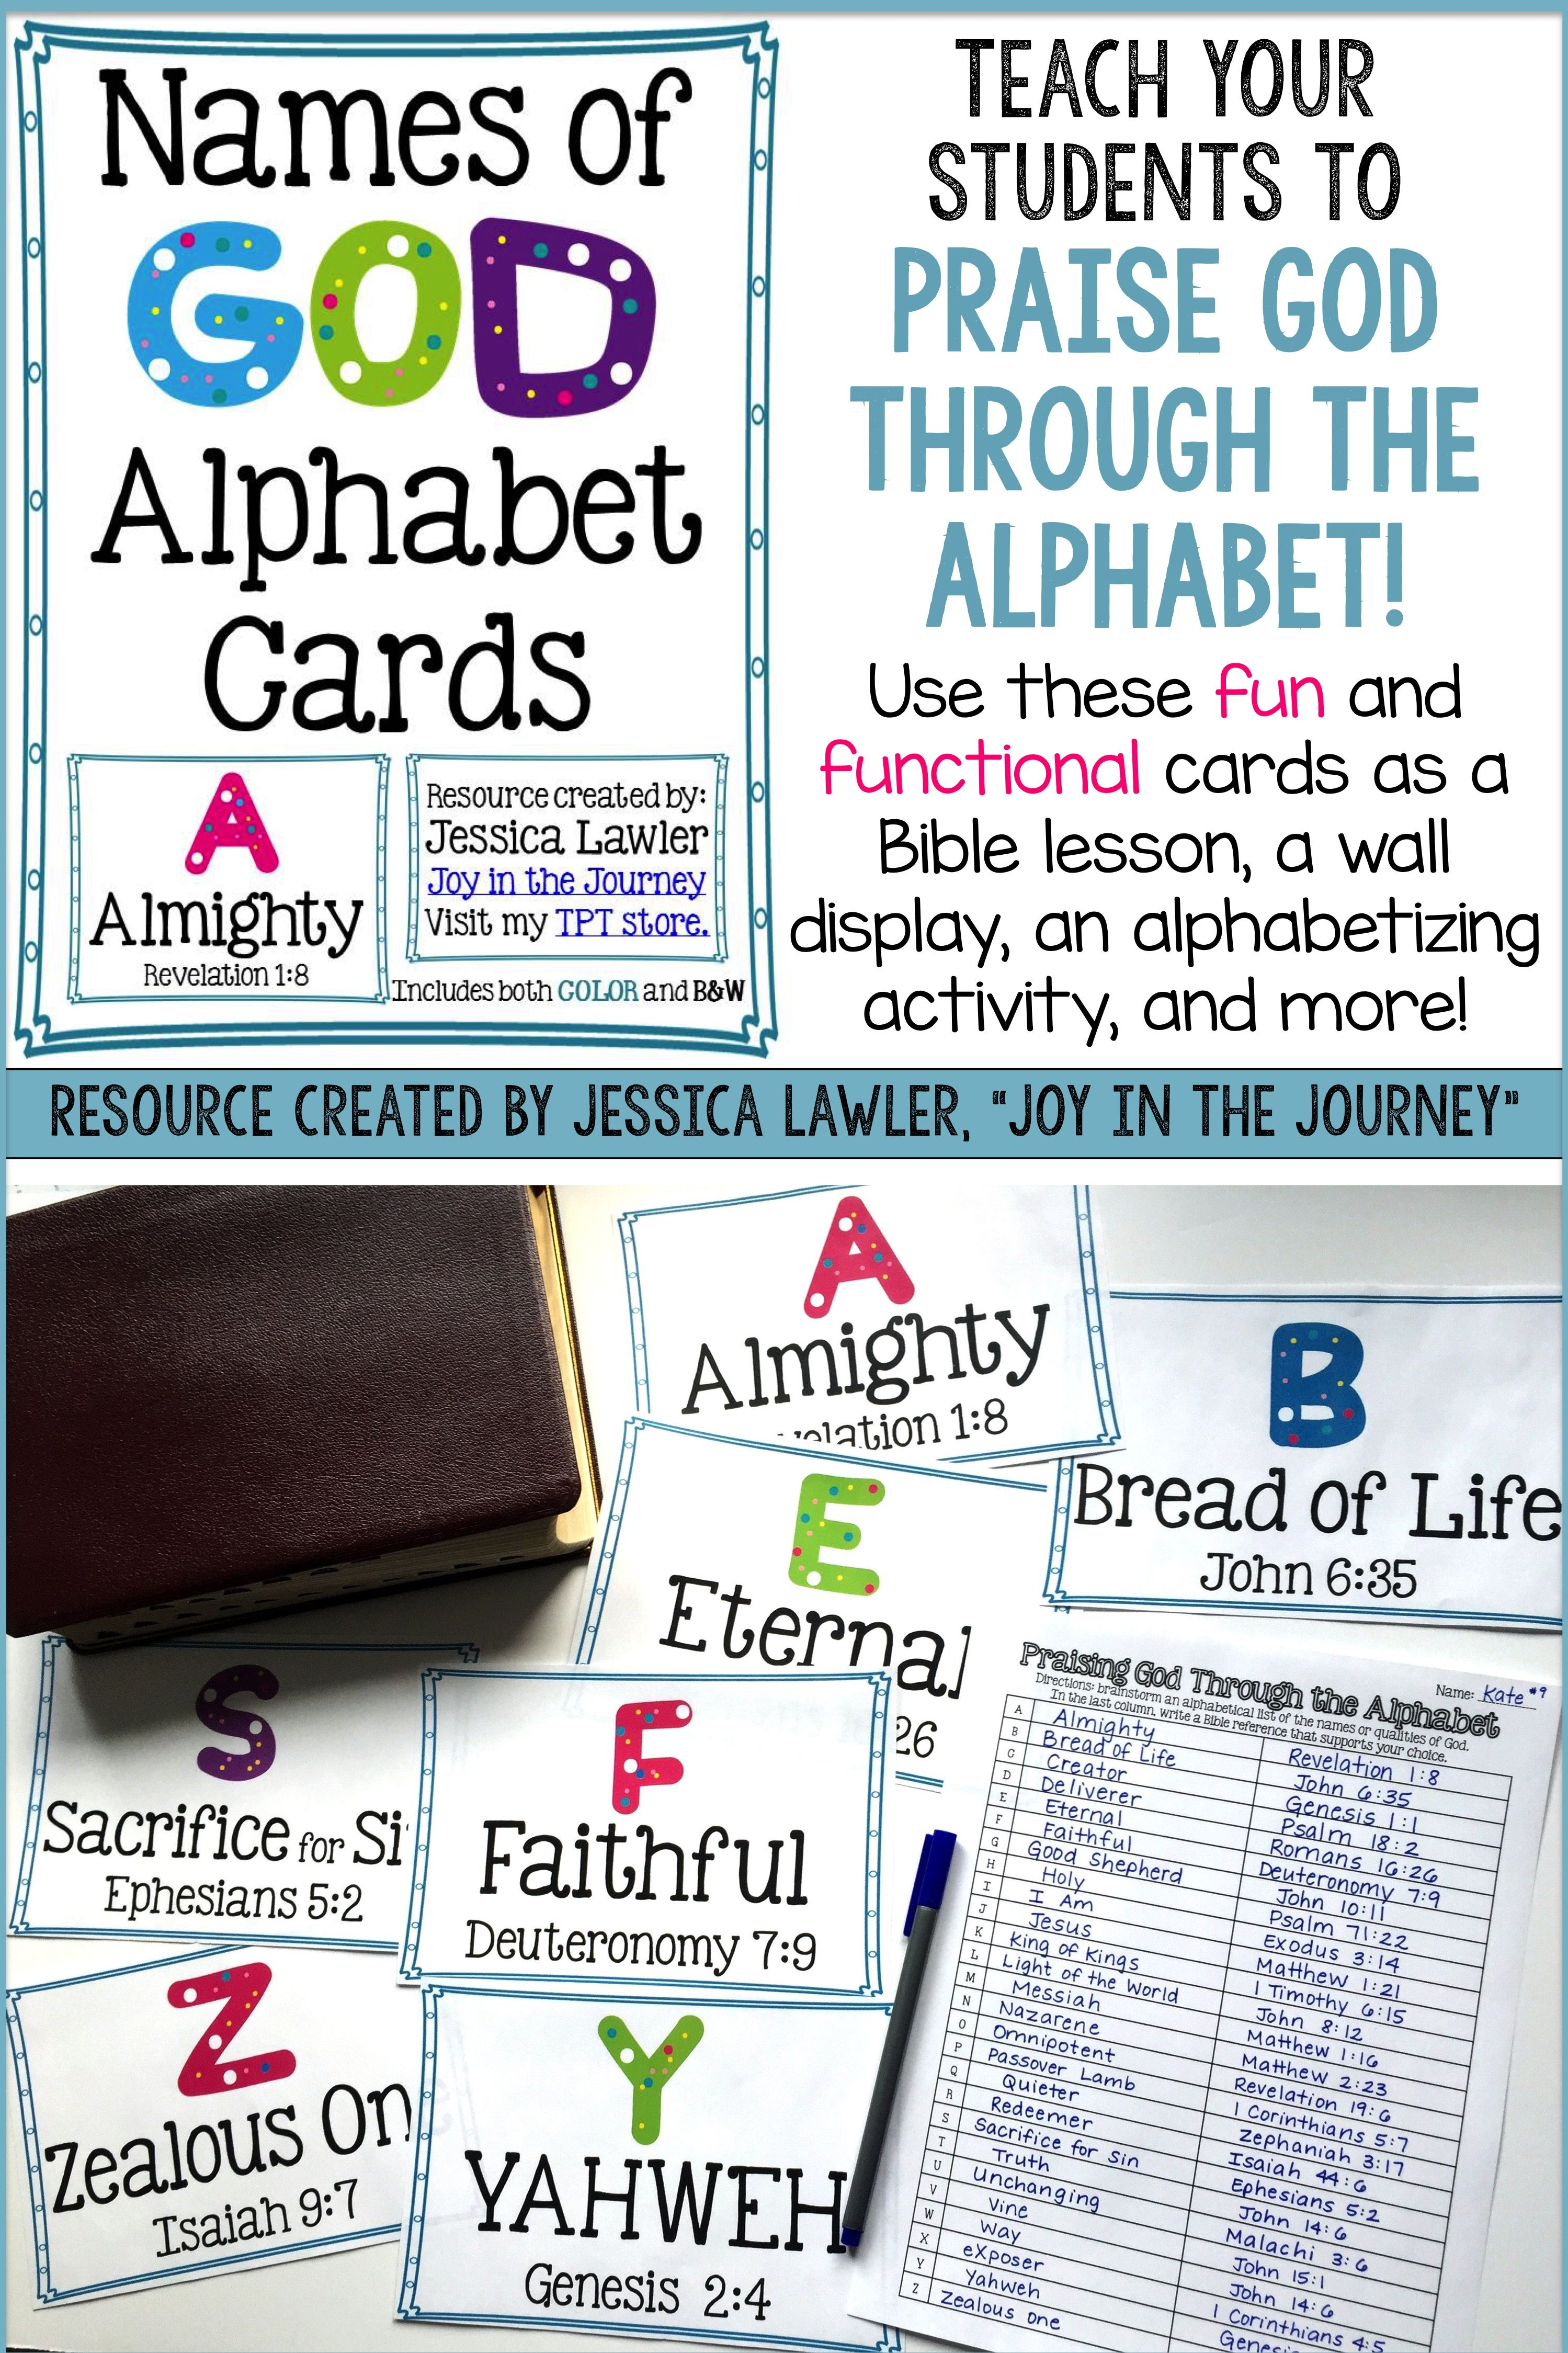 Alphabetical names of god